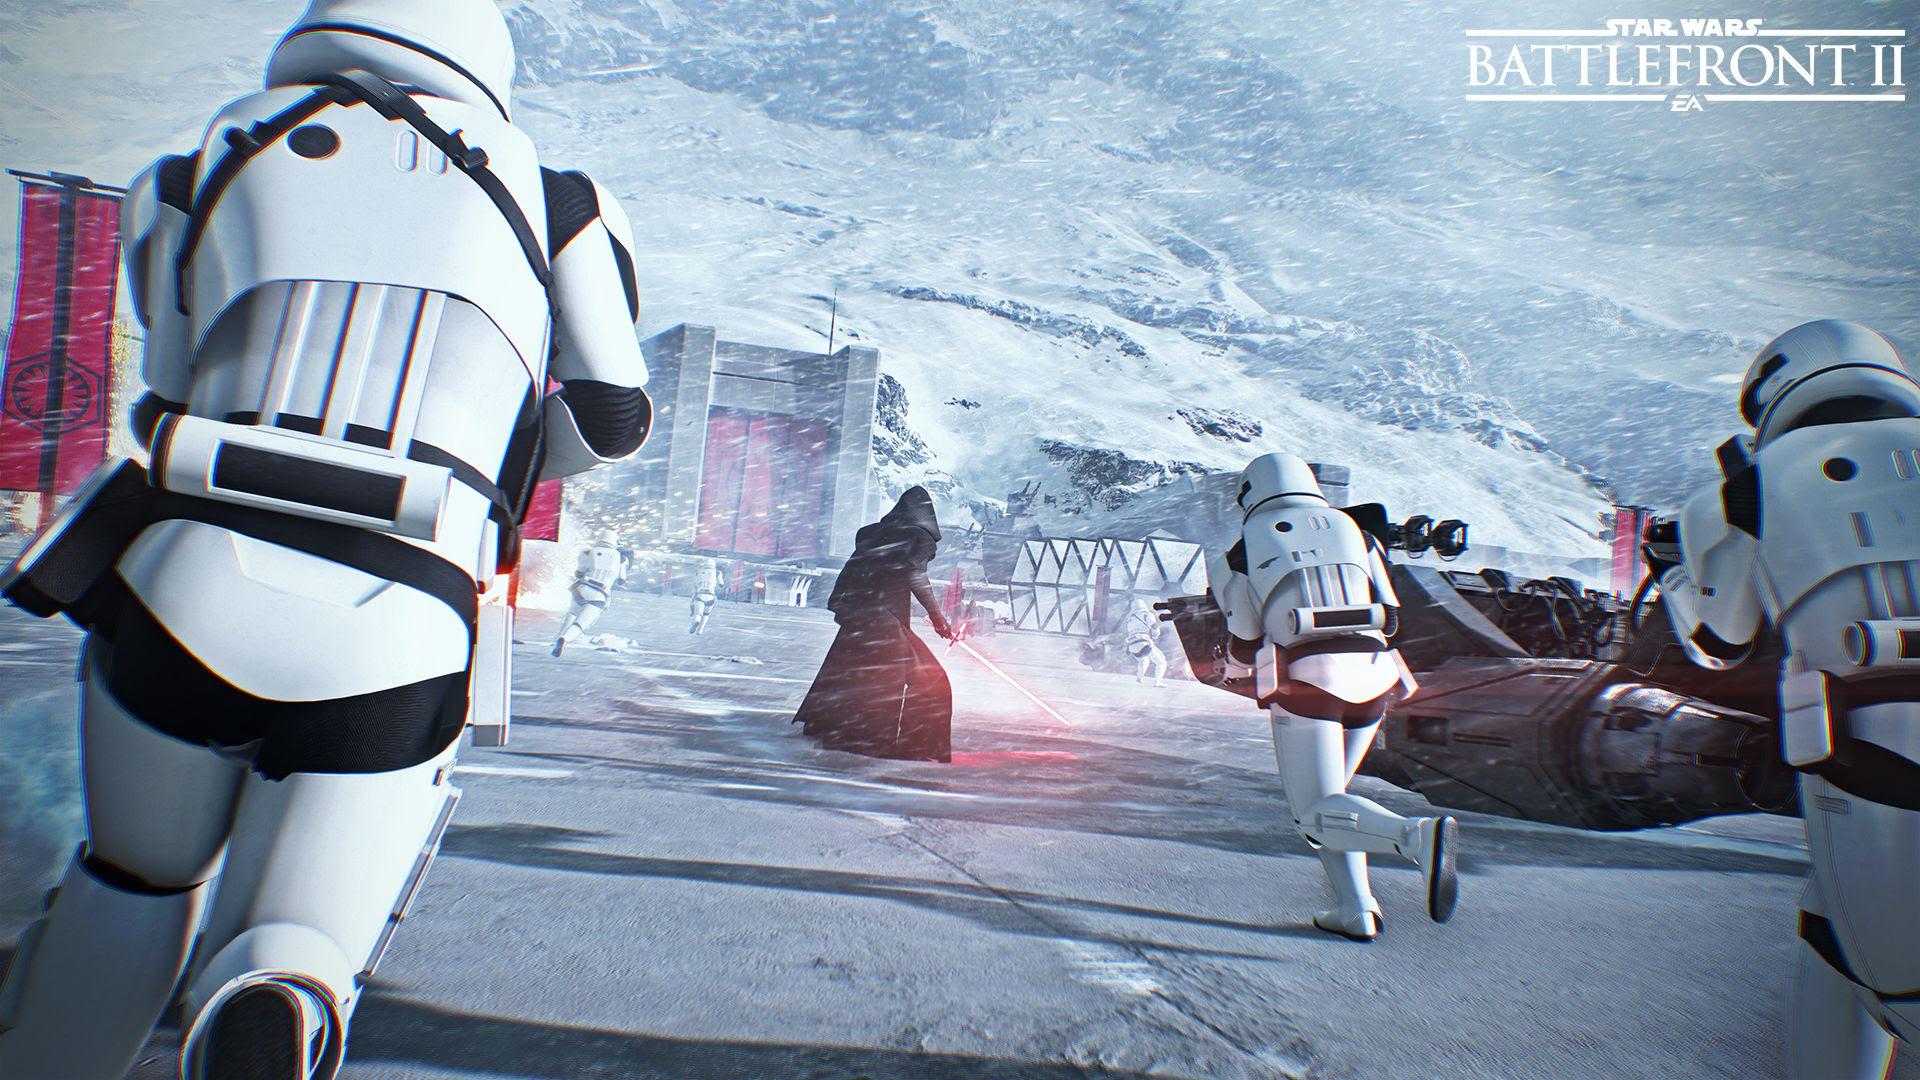 Star Wars Battlefront 2 gameplay video leaks online screenshot